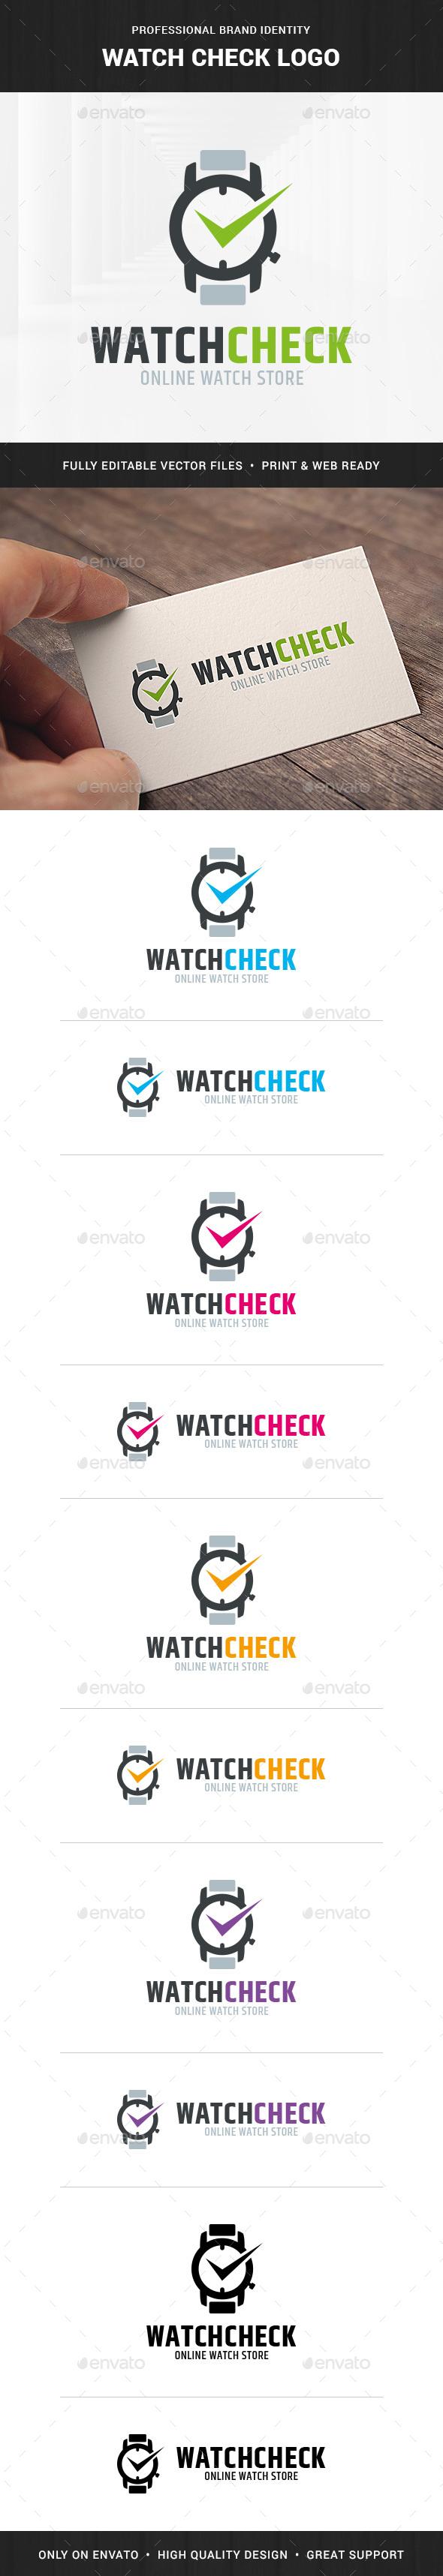 Watch Check Logo Template